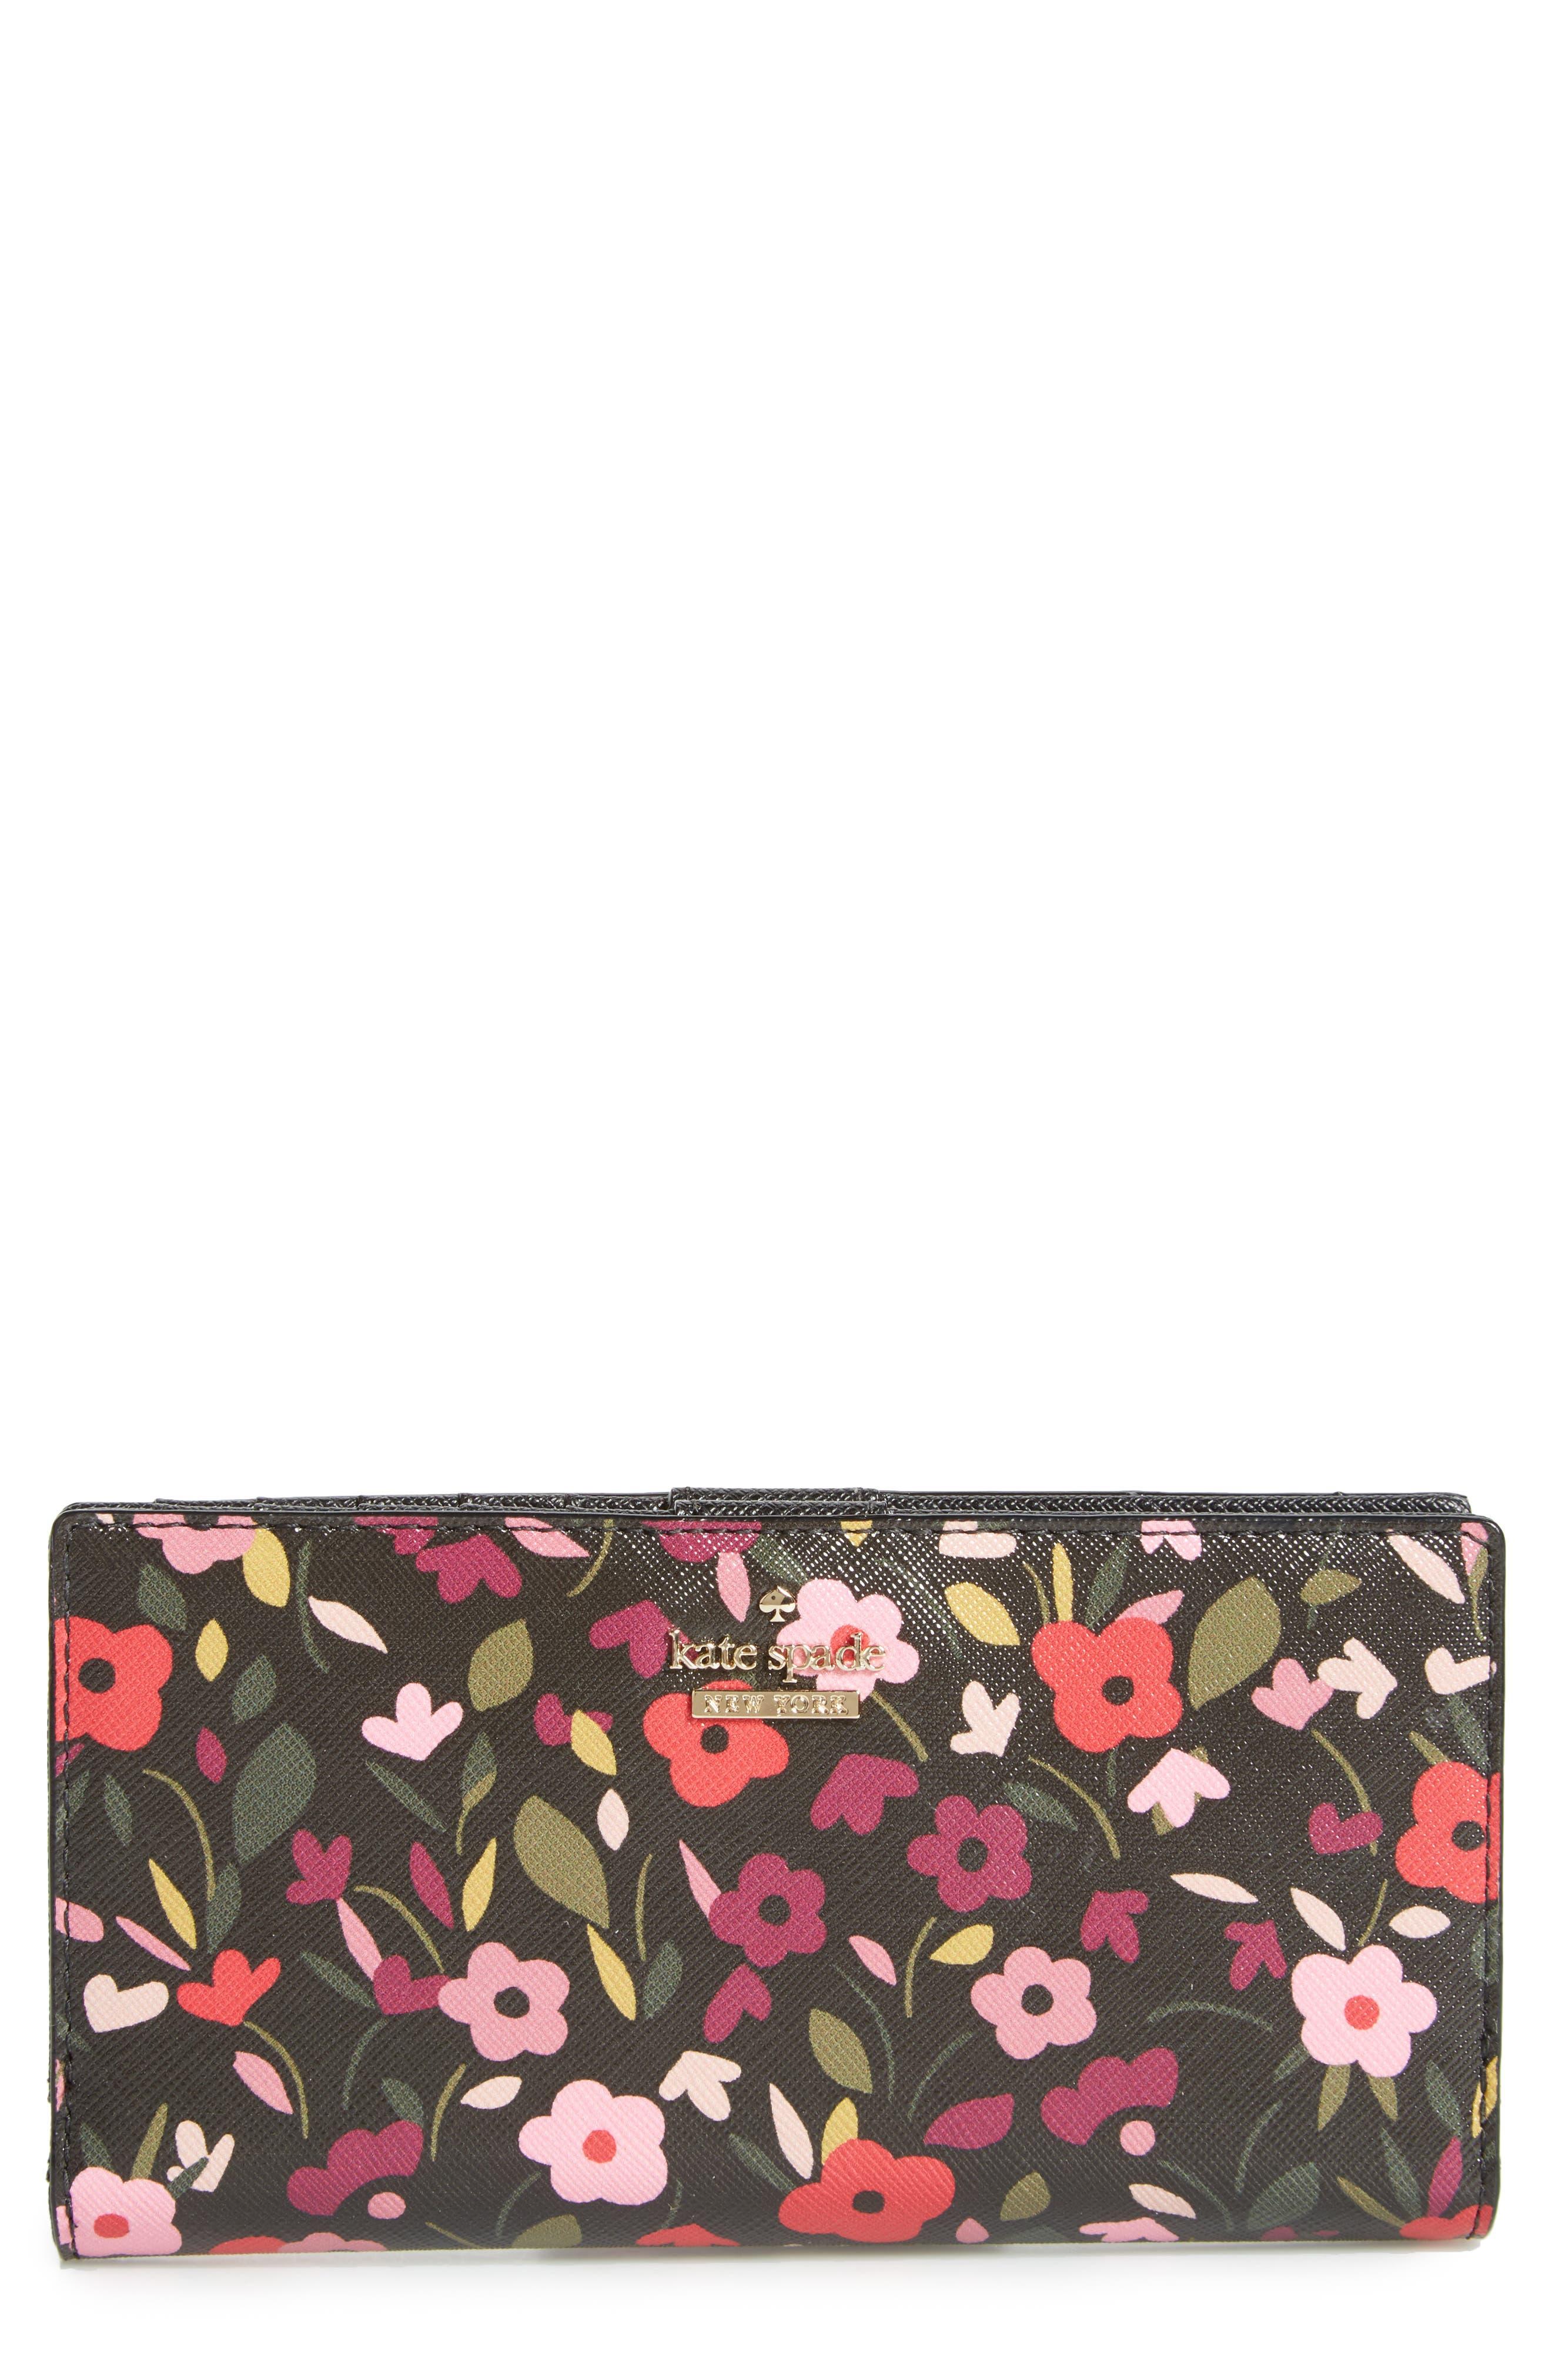 cameron street - stacy boho floral wallet,                         Main,                         color, Black Multi